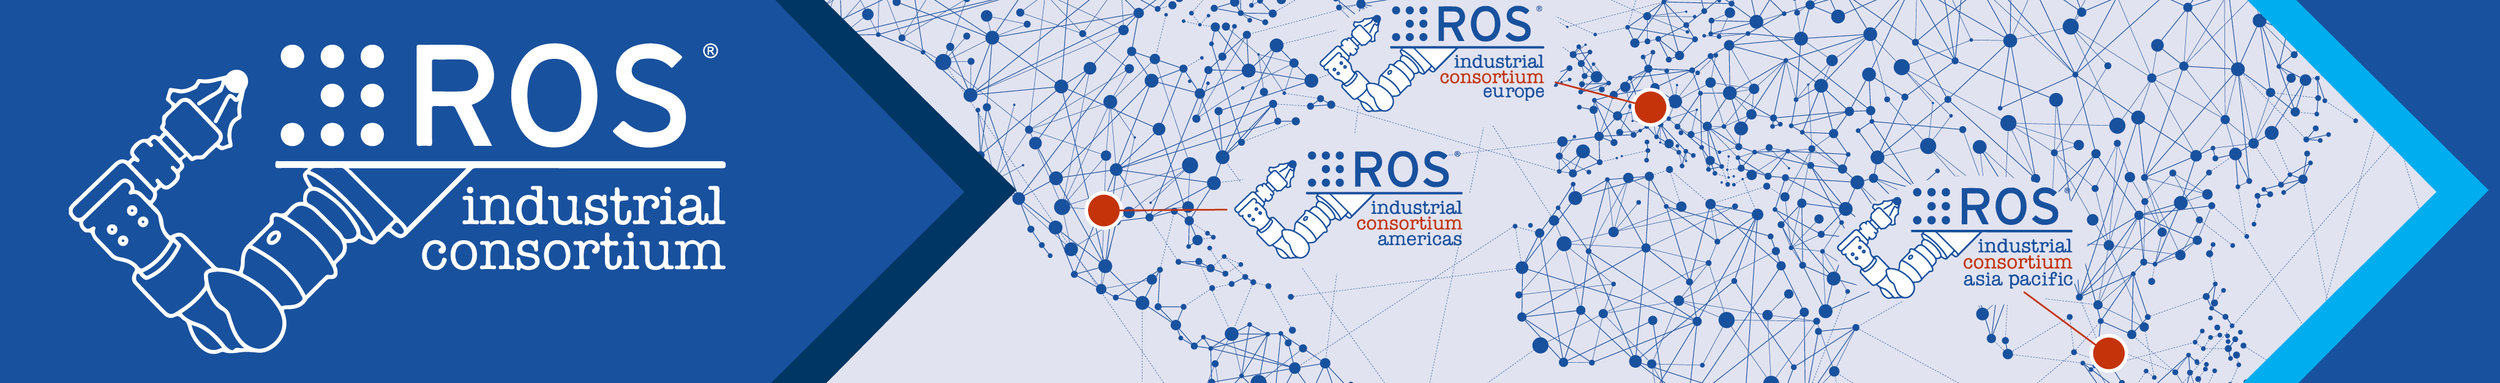 ROS-I-Web-banner5-980x150.jpg